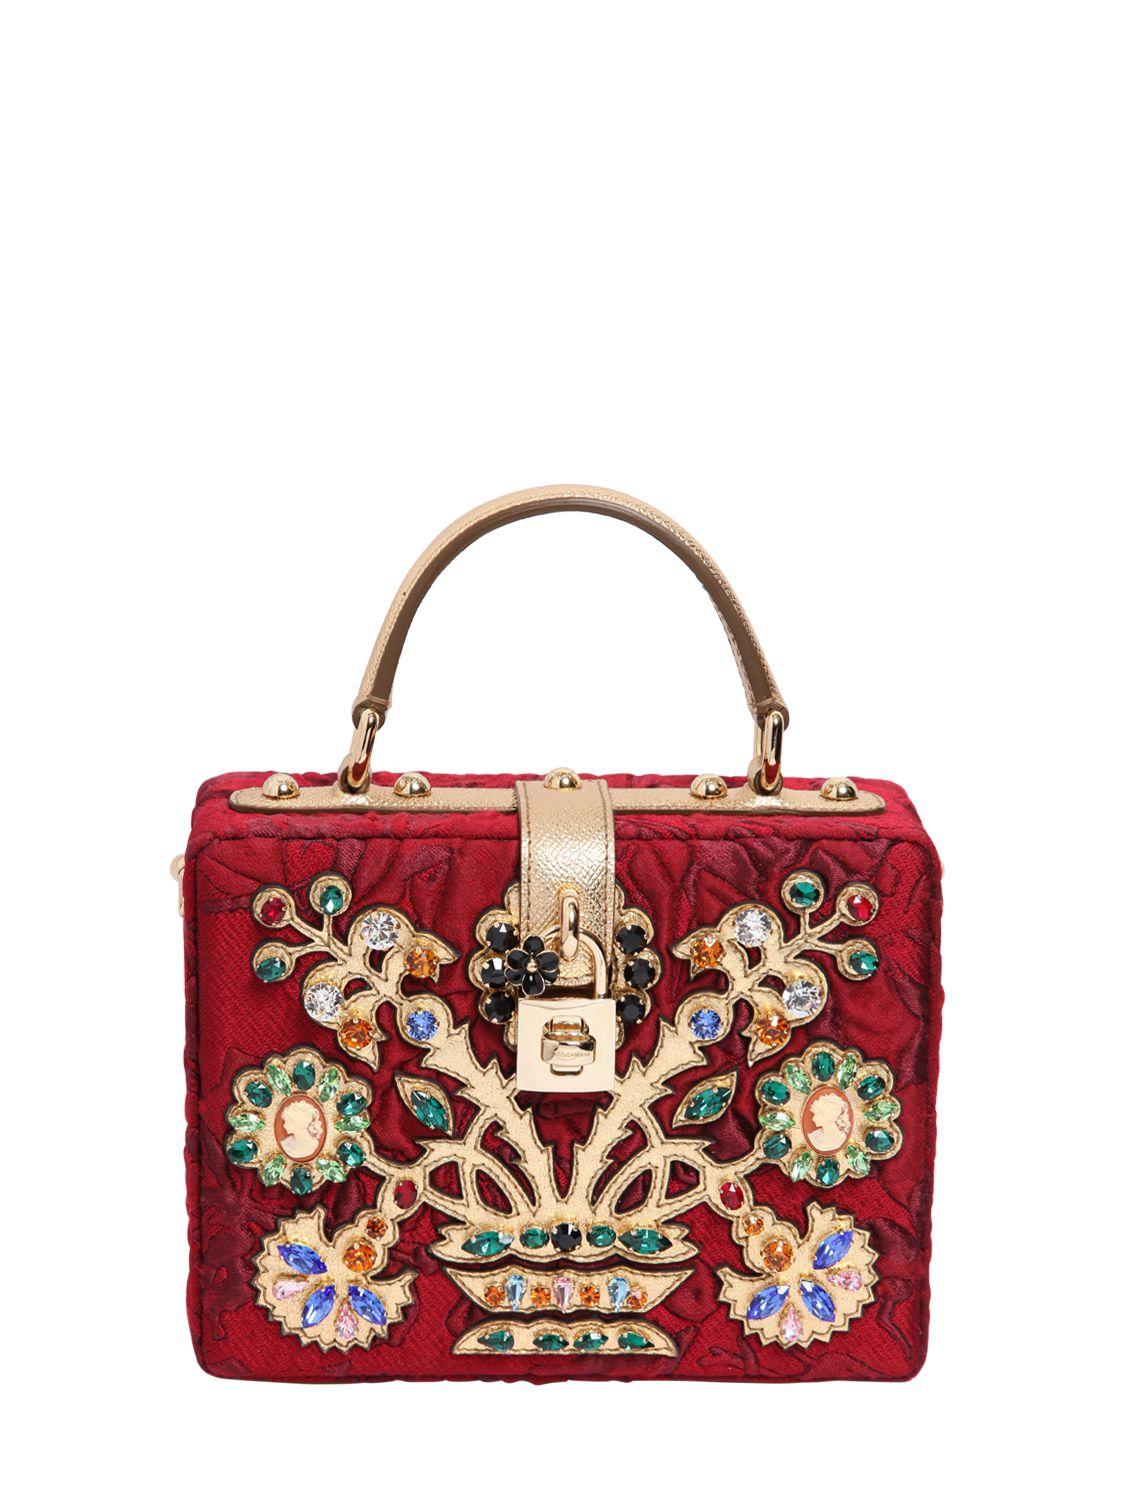 Dolce Gabbana Welcome Amore Graffiti Medium Handbag Neiman Marcus 1dc683ce448e2